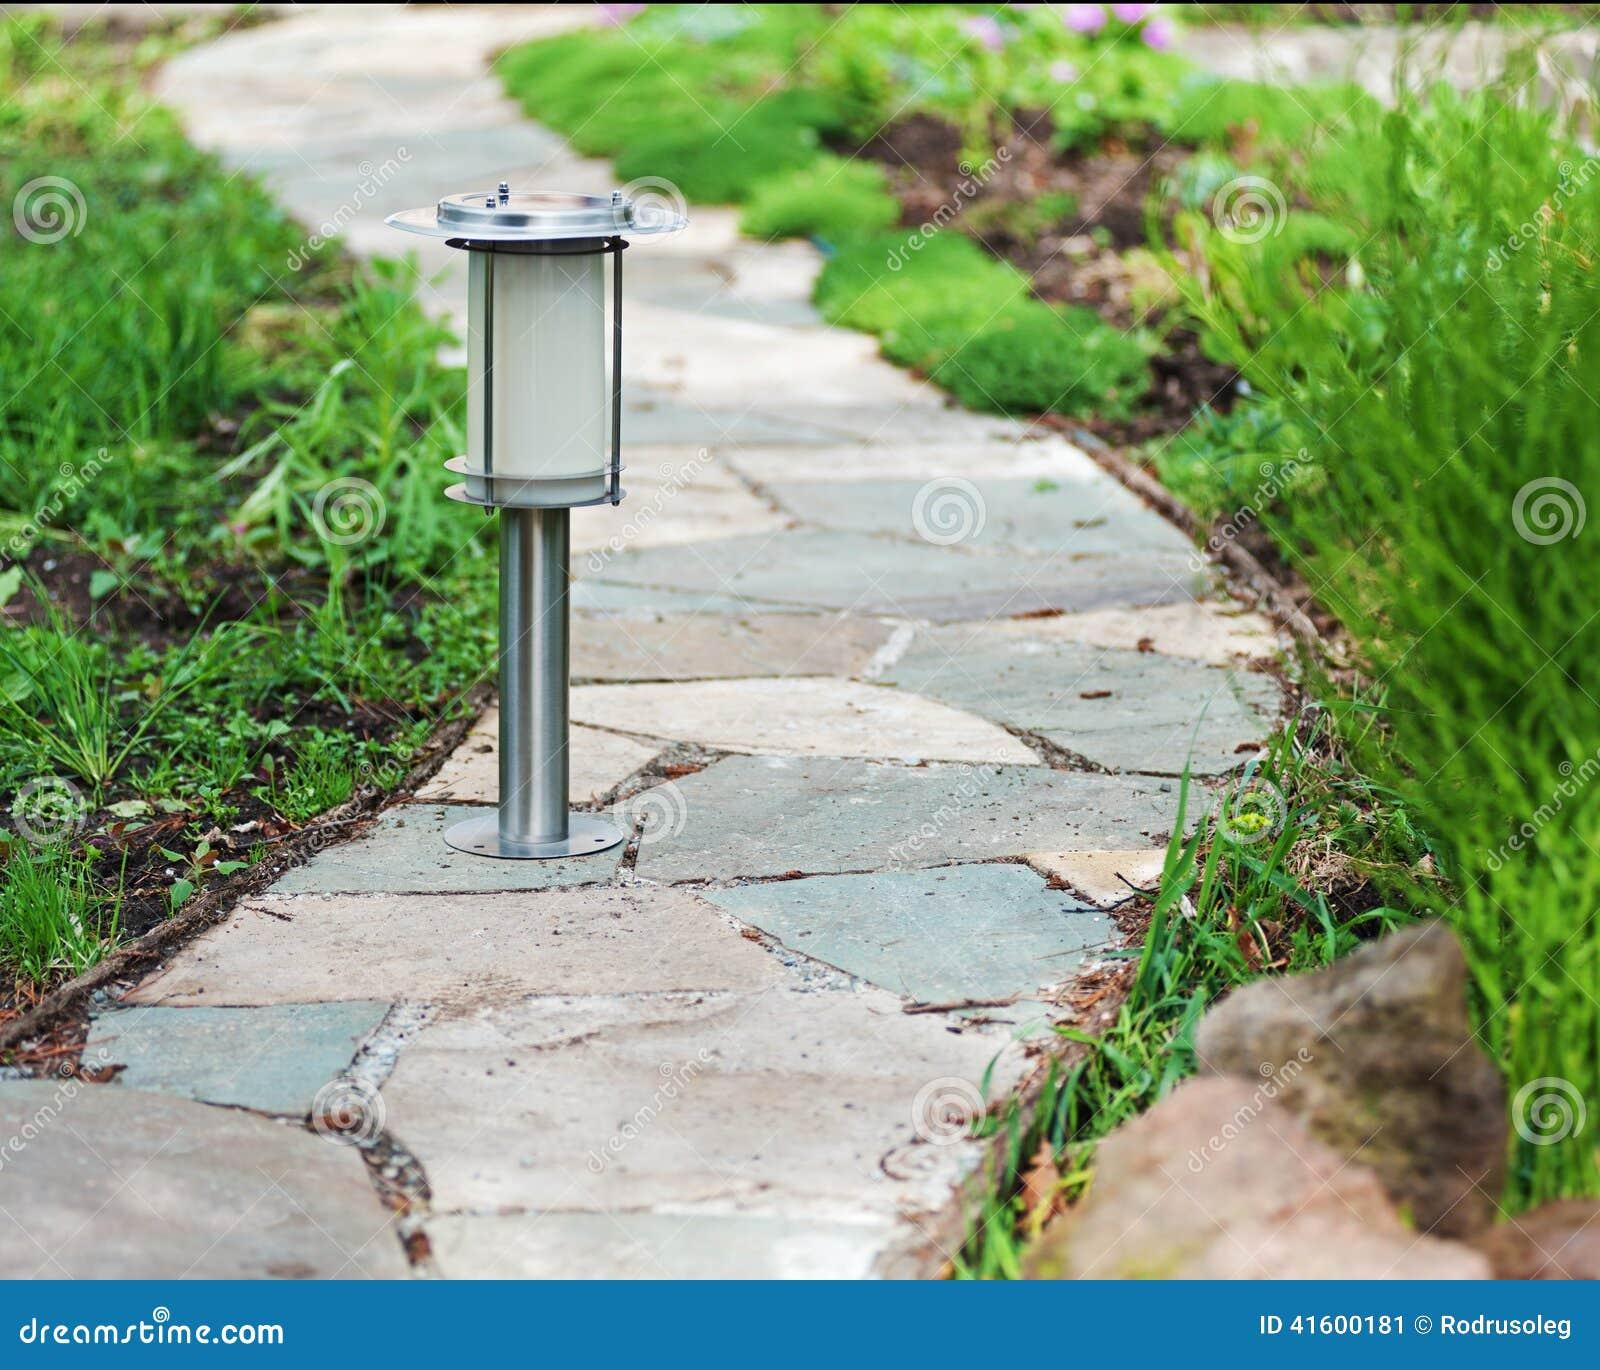 Lampade solari ikea lampade da giardino leroy merlin for Doccia solare da giardino leroy merlin